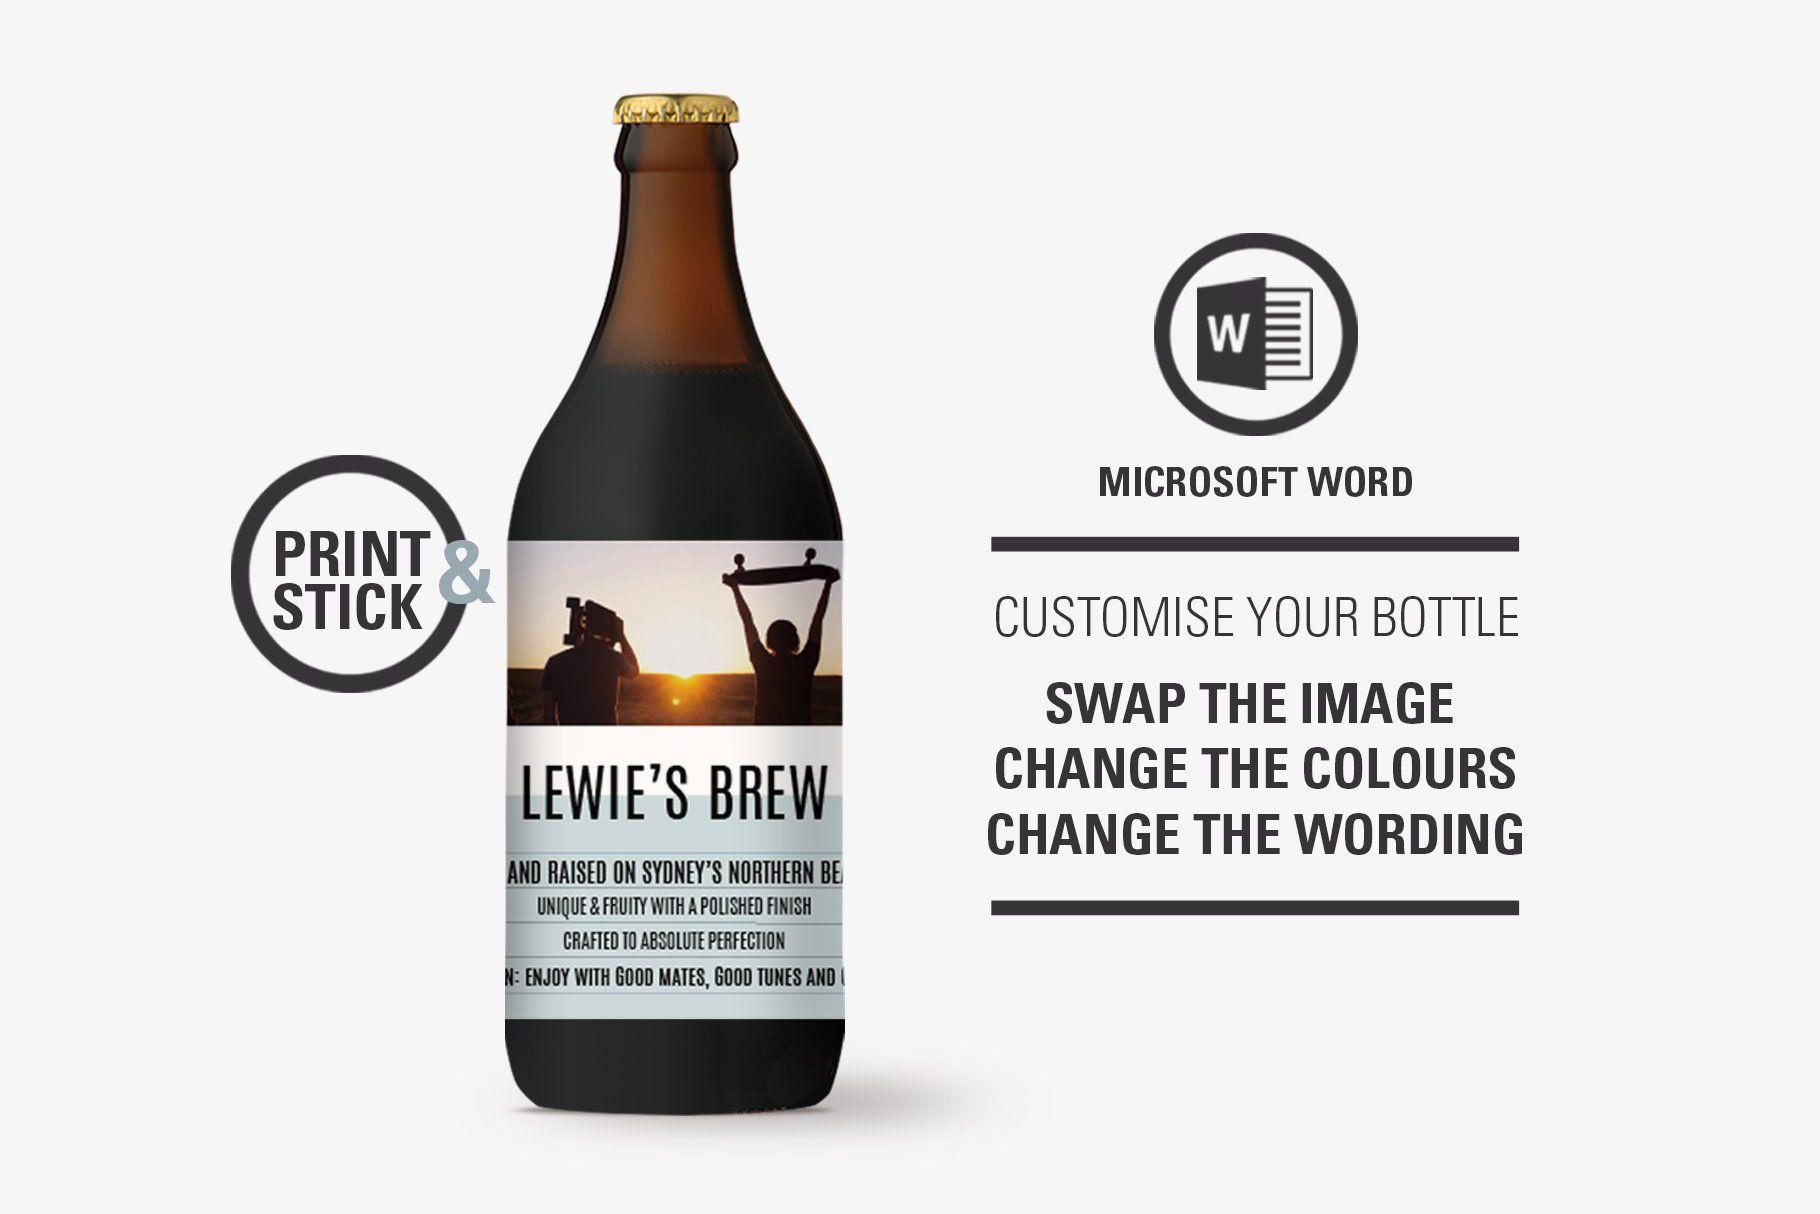 005 Stunning Microsoft Word Beer Label Template Sample  BottleFull